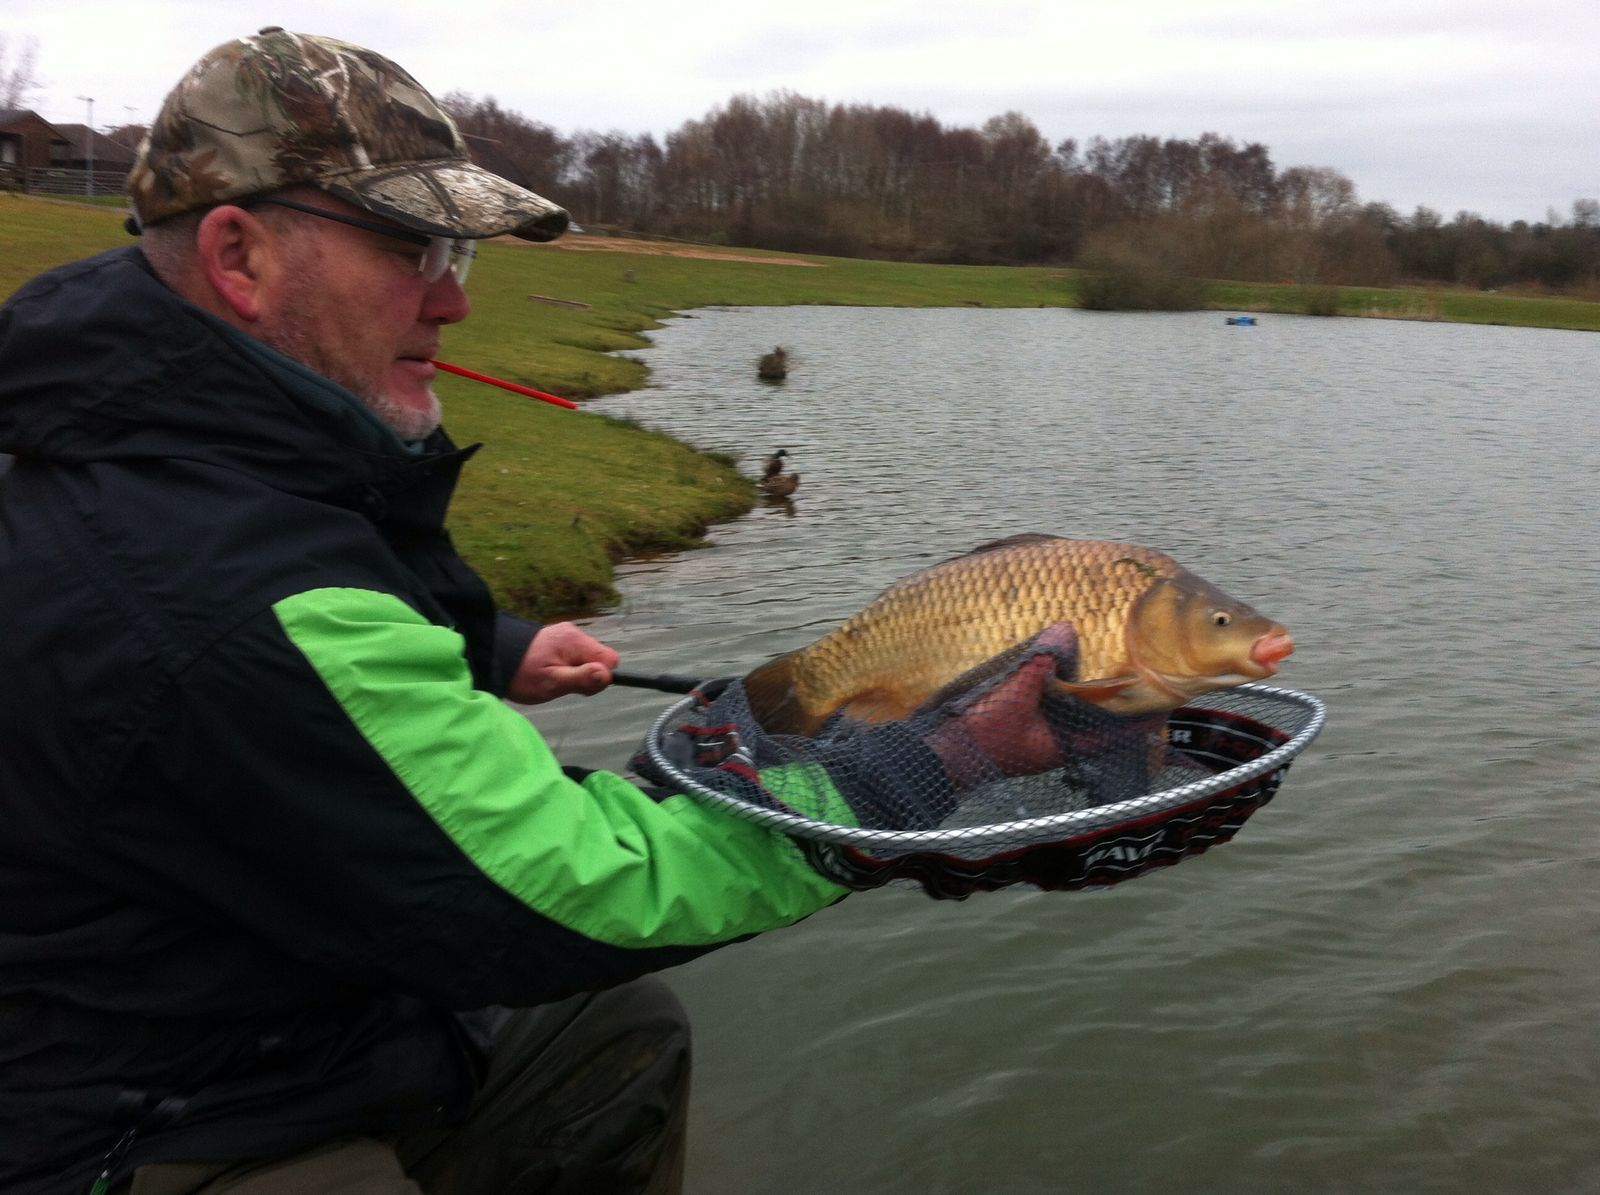 Stu-Ballard-4lb-f1-carp-match-lake-pleasure-fishing-banded-pellet-on-pole-tactics